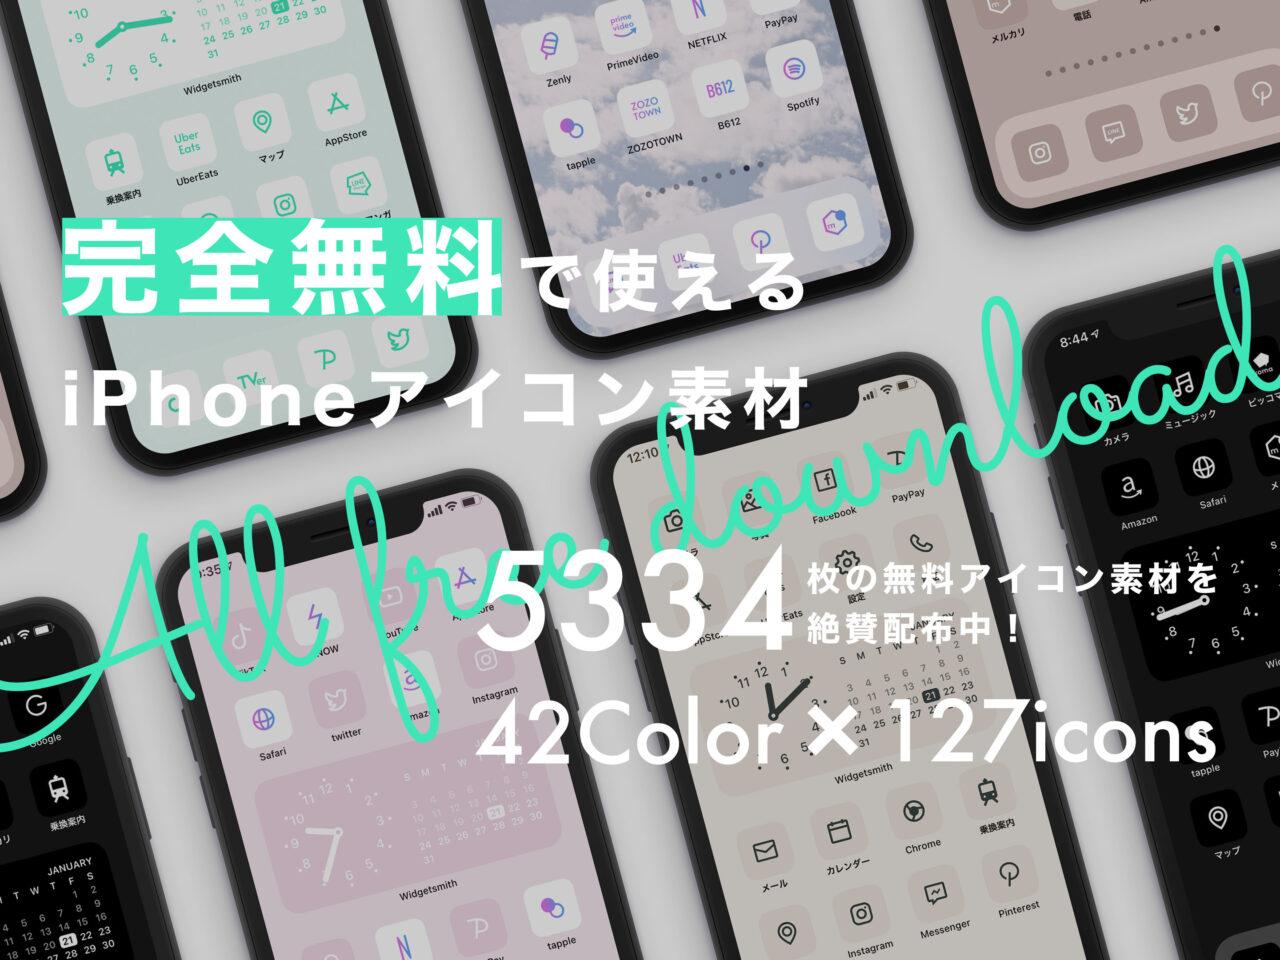 iPhone・iOS14アイコン素材ダウンロードページのキービジュアル